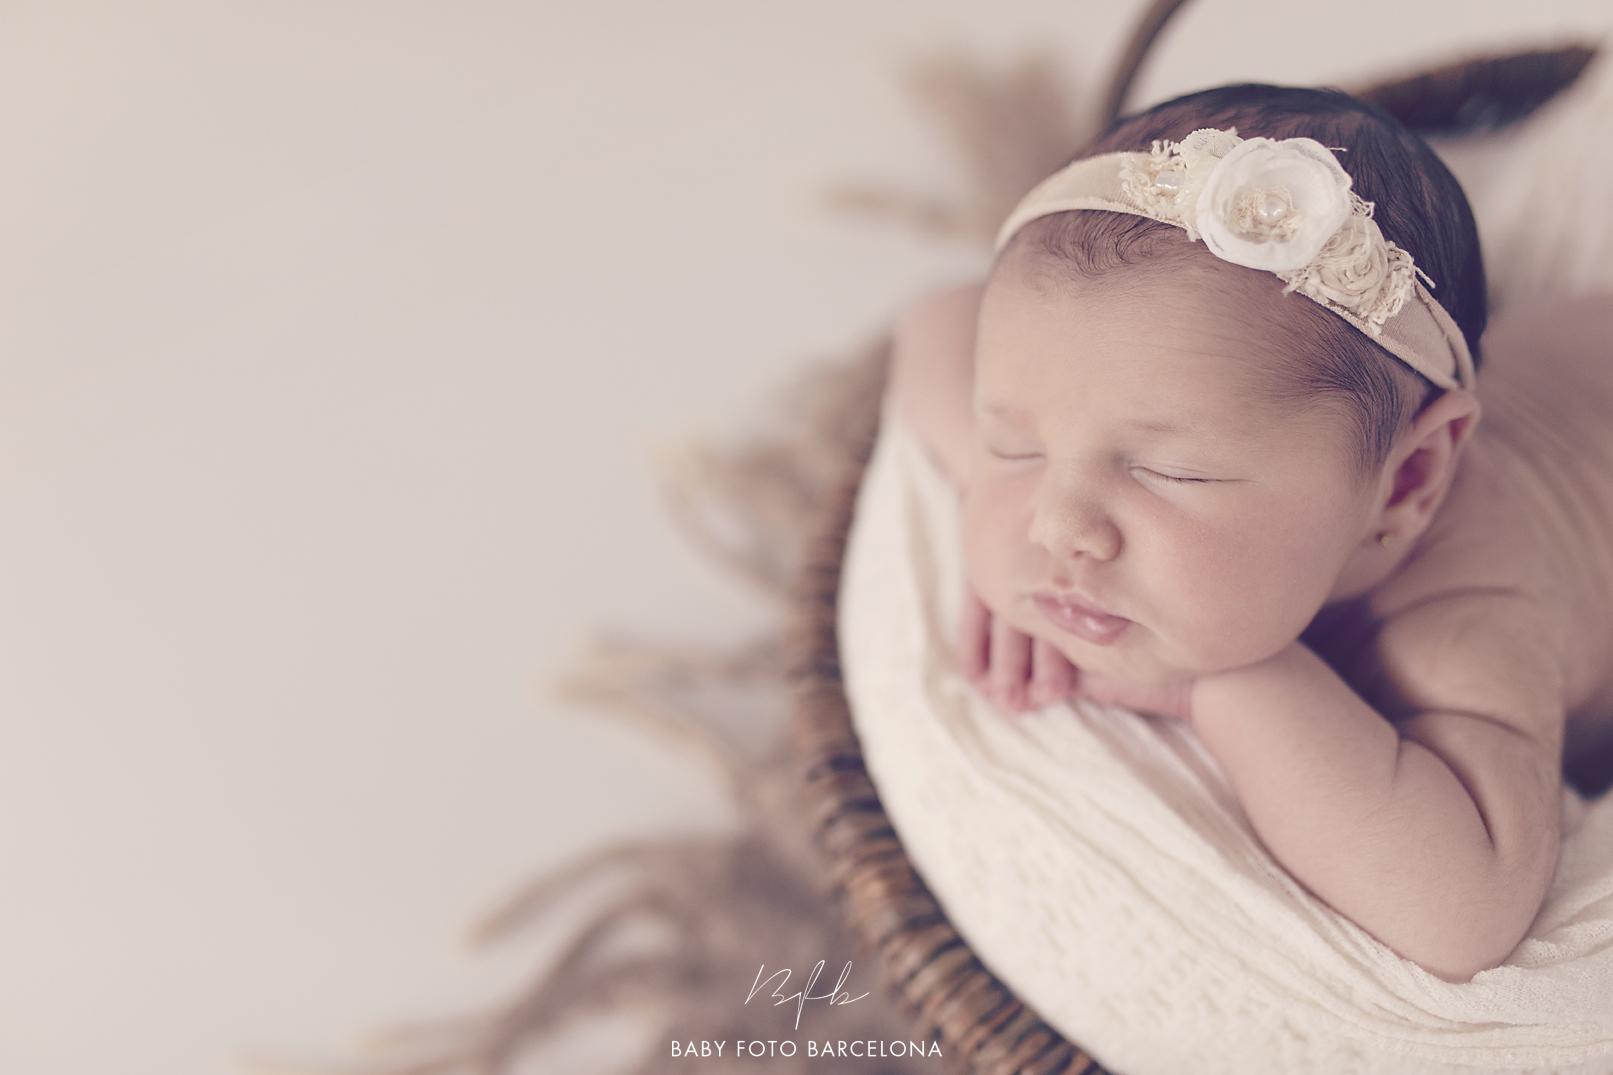 Baby Foto Barcelona - Sesión Newborn (recién nacido) / Sessió nounats